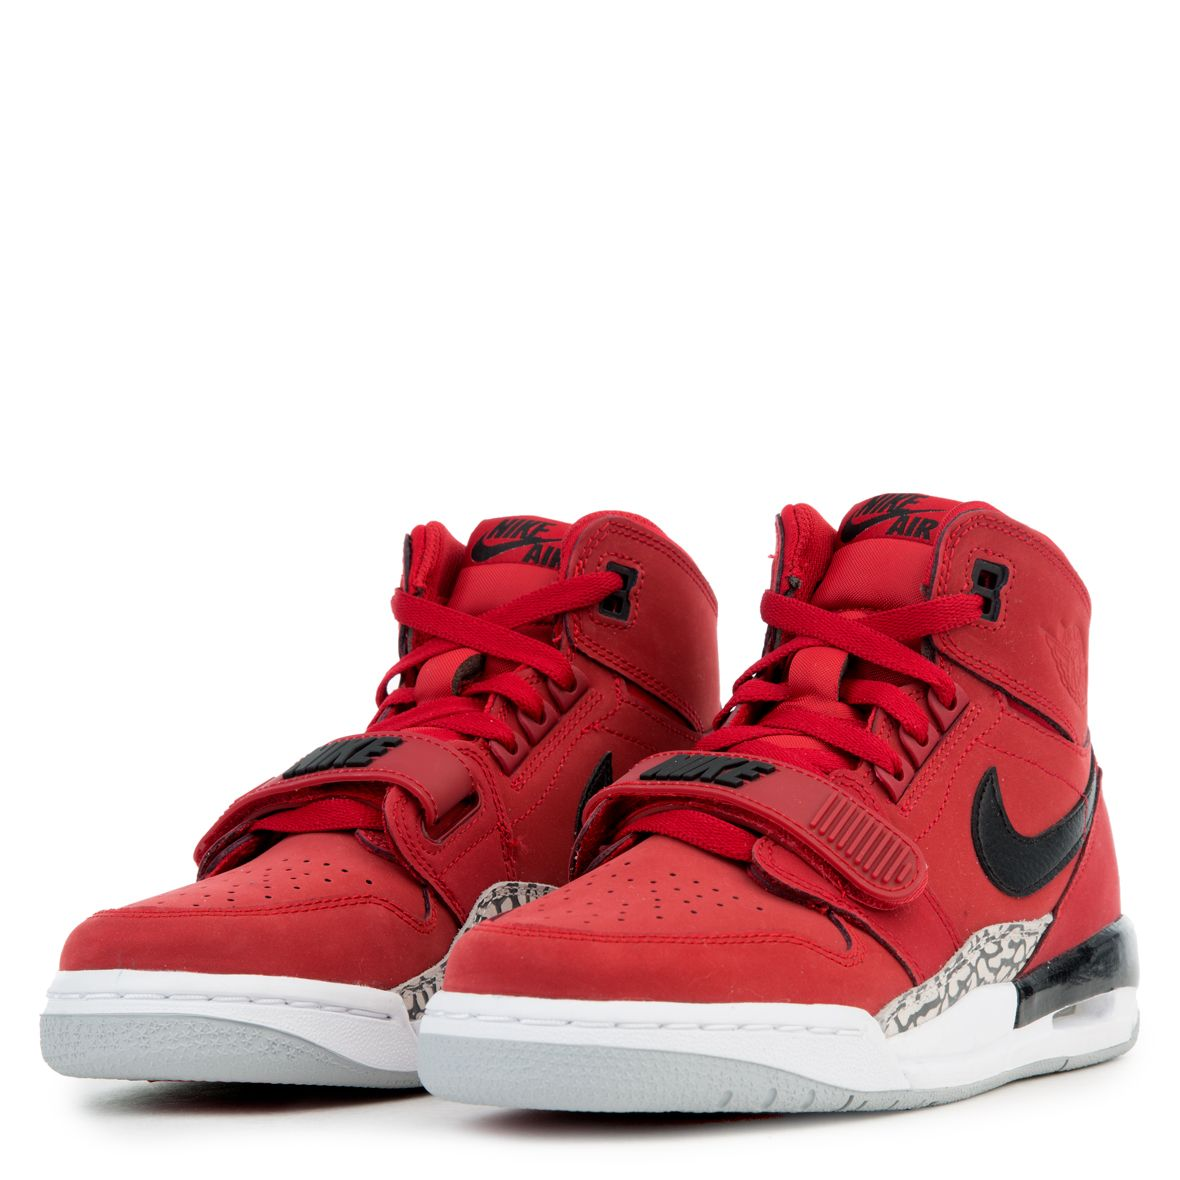 sports shoes be5d5 2242a ... AIR JORDAN LEGACY 312 VARSITY RED BLACK-WHITE ...